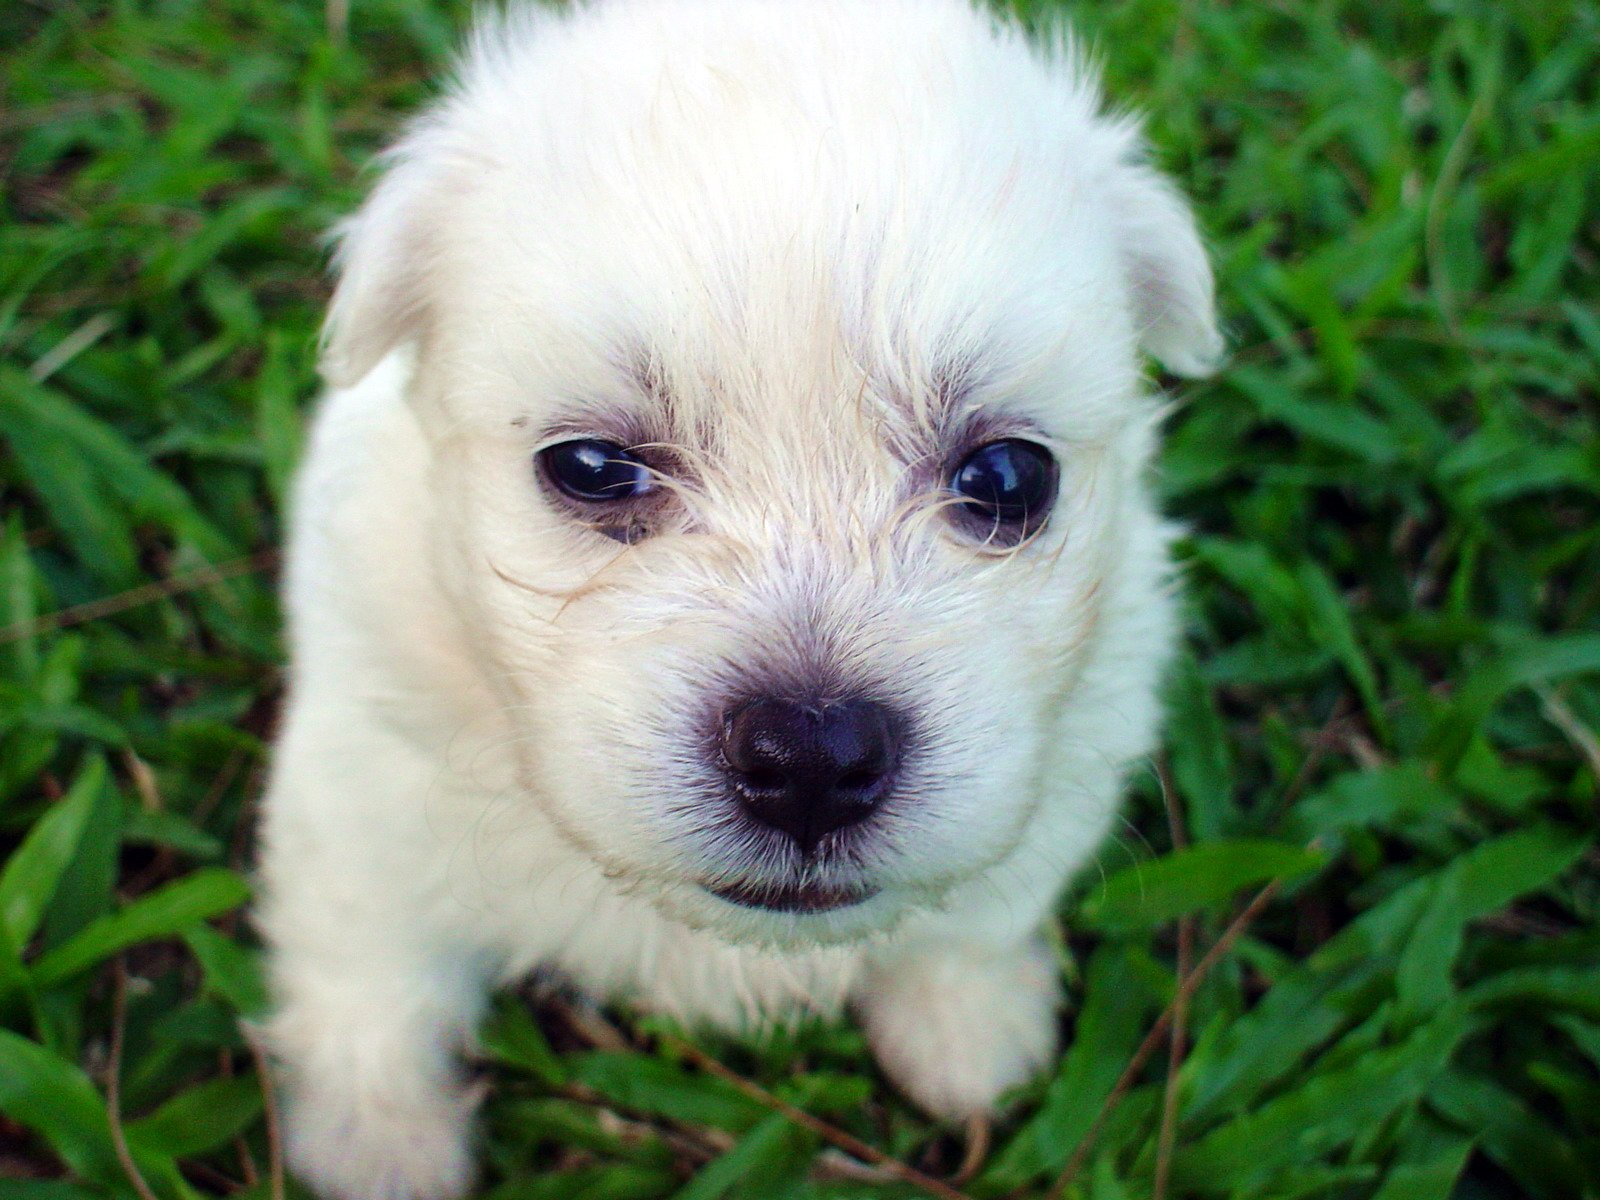 Free Sad Puppy Stock Photo - FreeImages.com